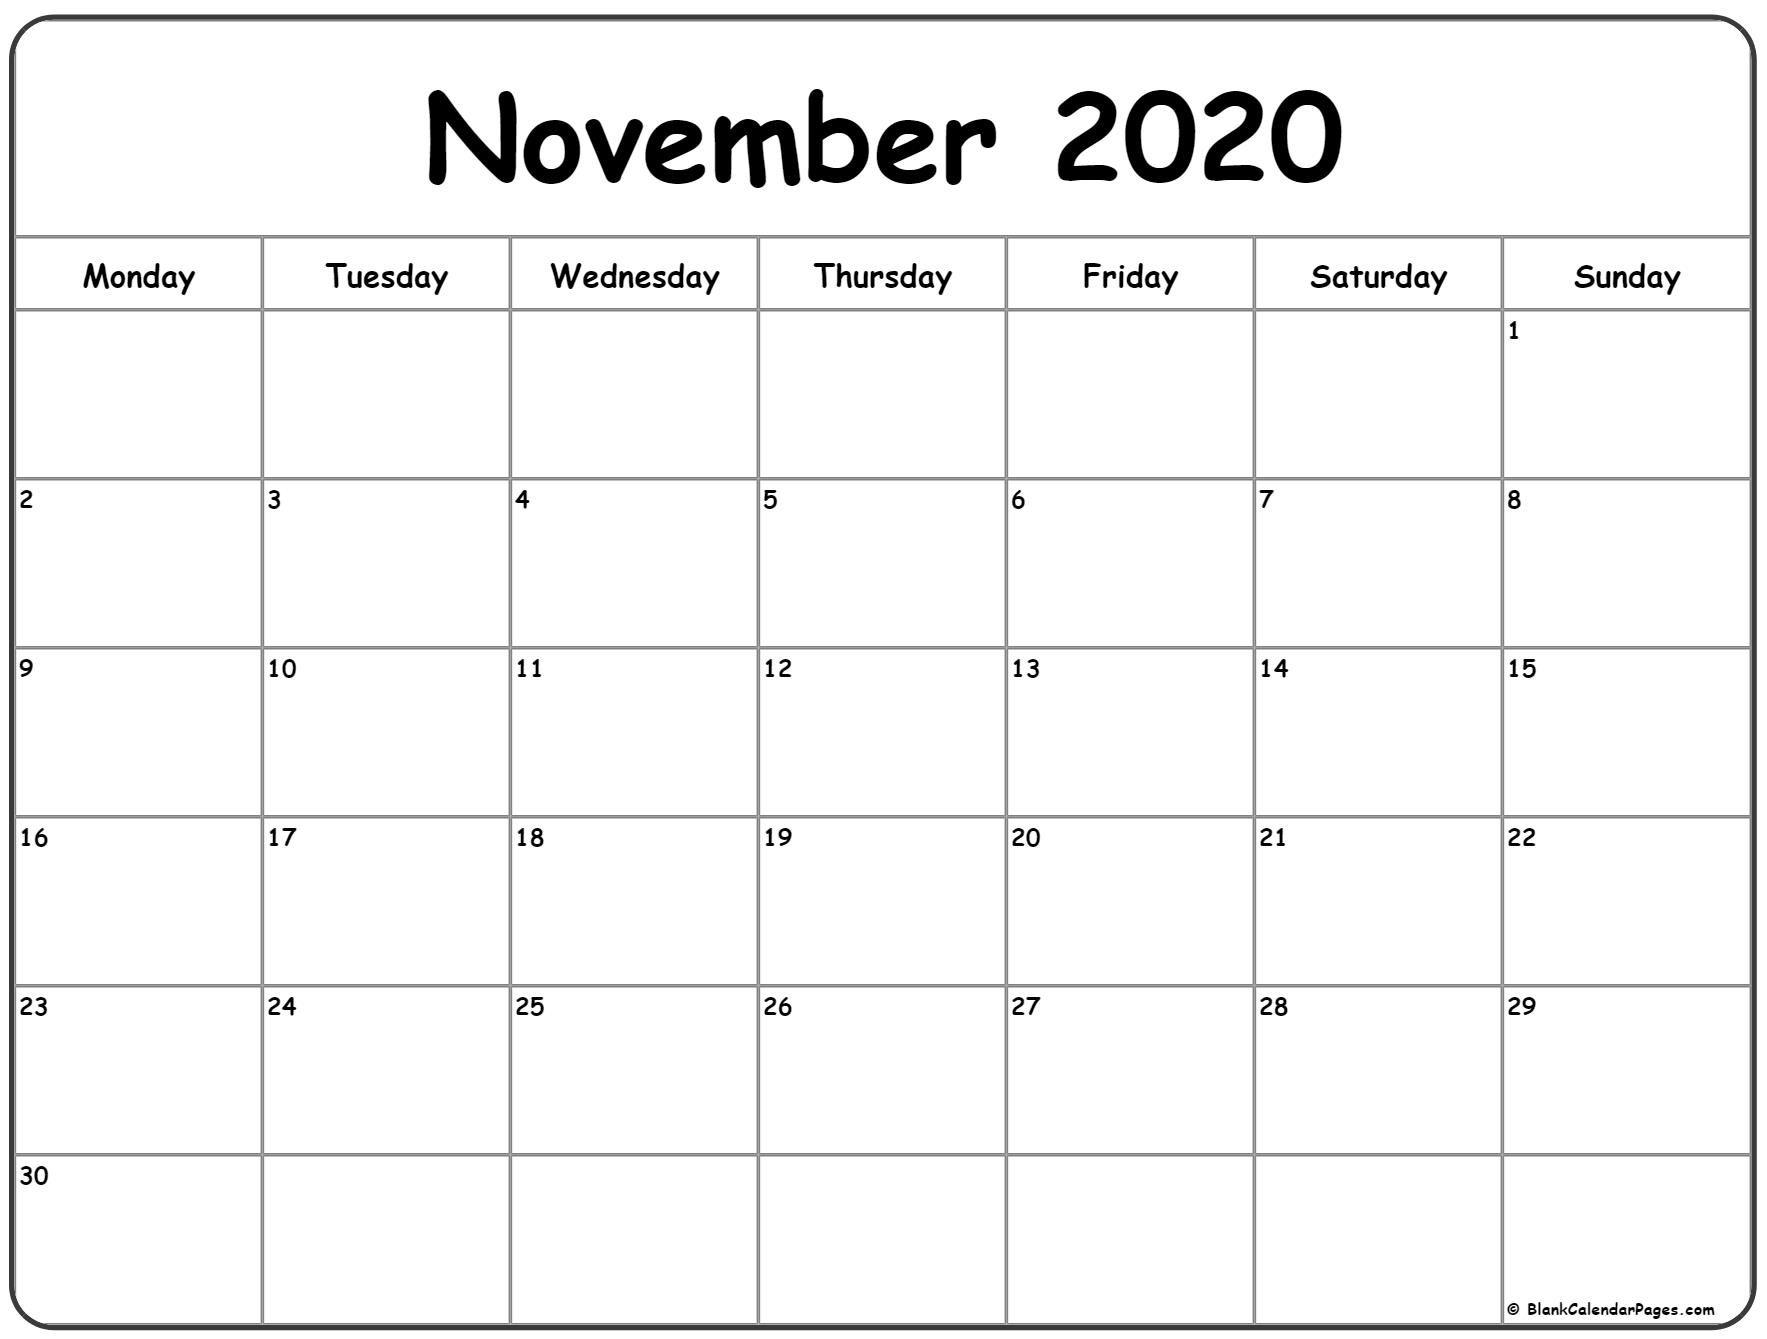 November 2020 Monday Calendar   Monday To Sunday In 2020 throughout Monday Through Sunday